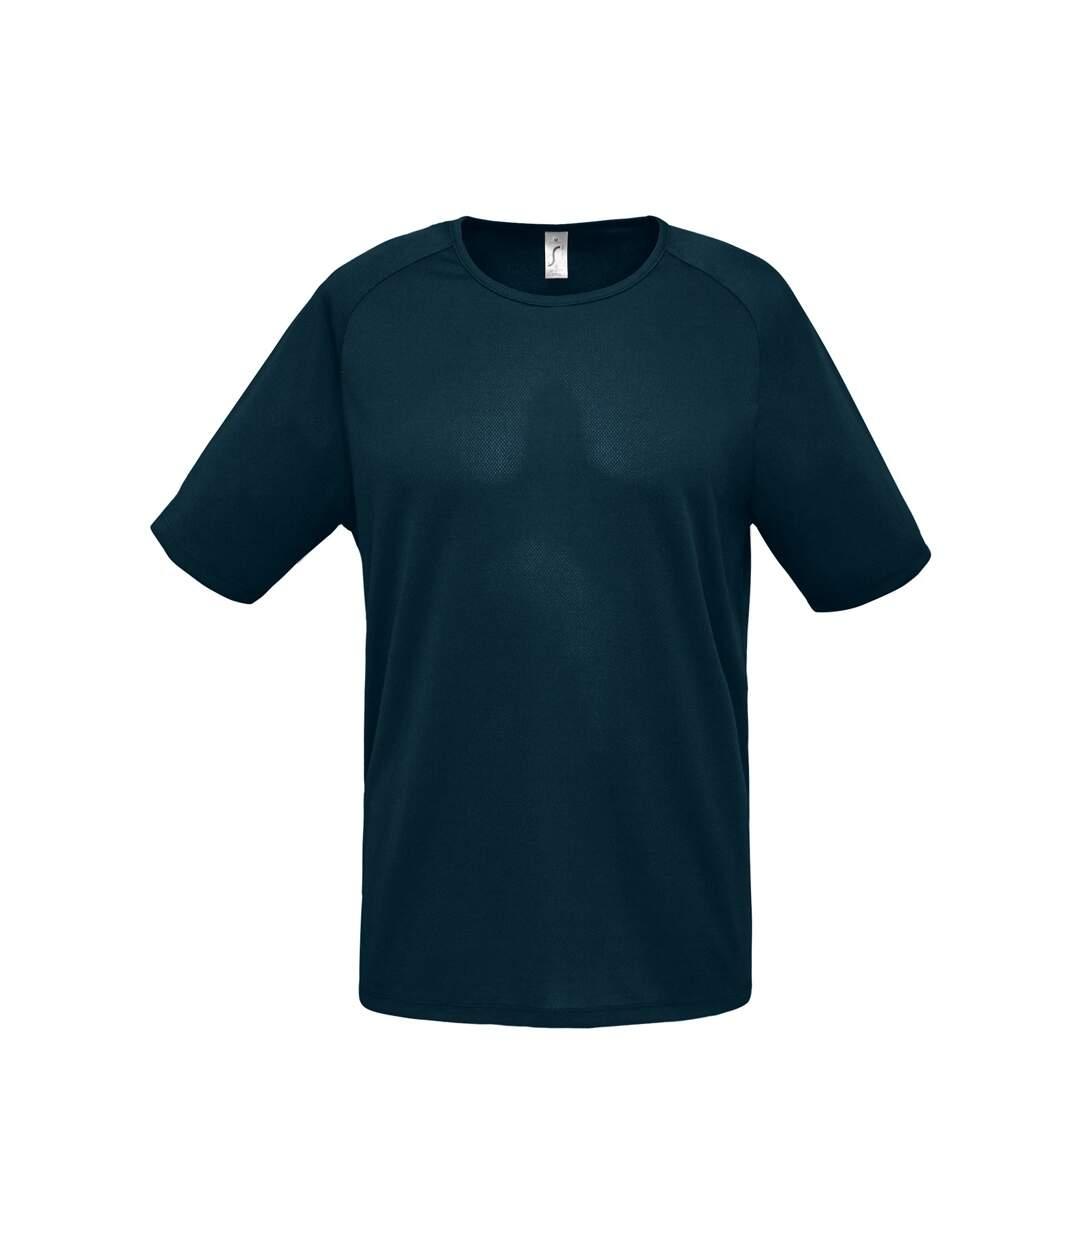 SOLS Mens Sporty Short Sleeve Performance T-Shirt (Petroleum Blue) - UTPC303